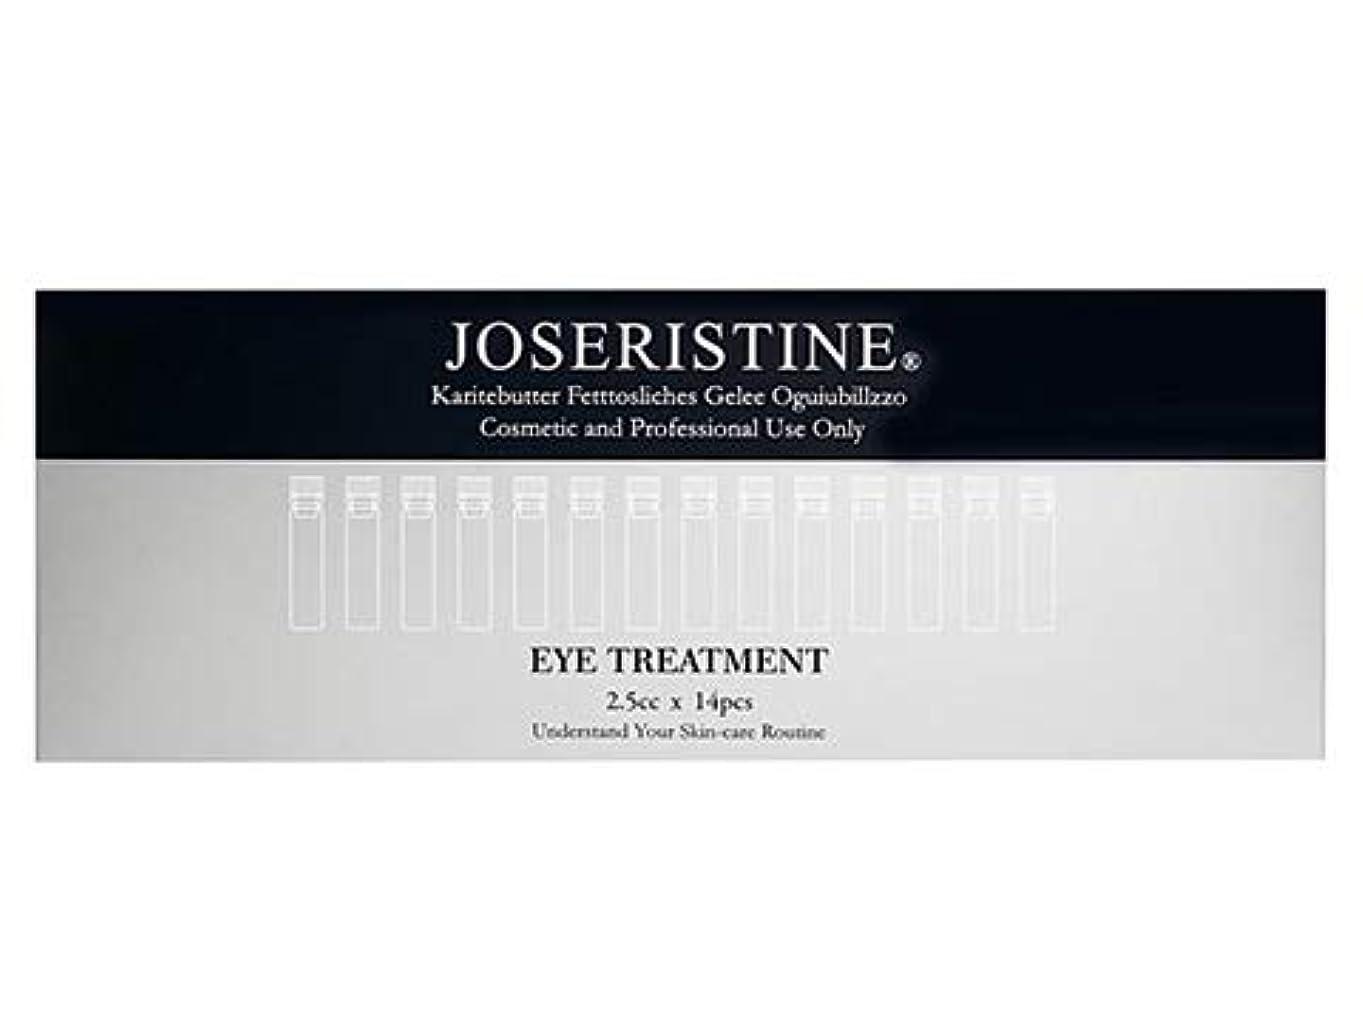 [Joseristine] アイ トリートメント Joseristine Eye Treatment (14pcs)